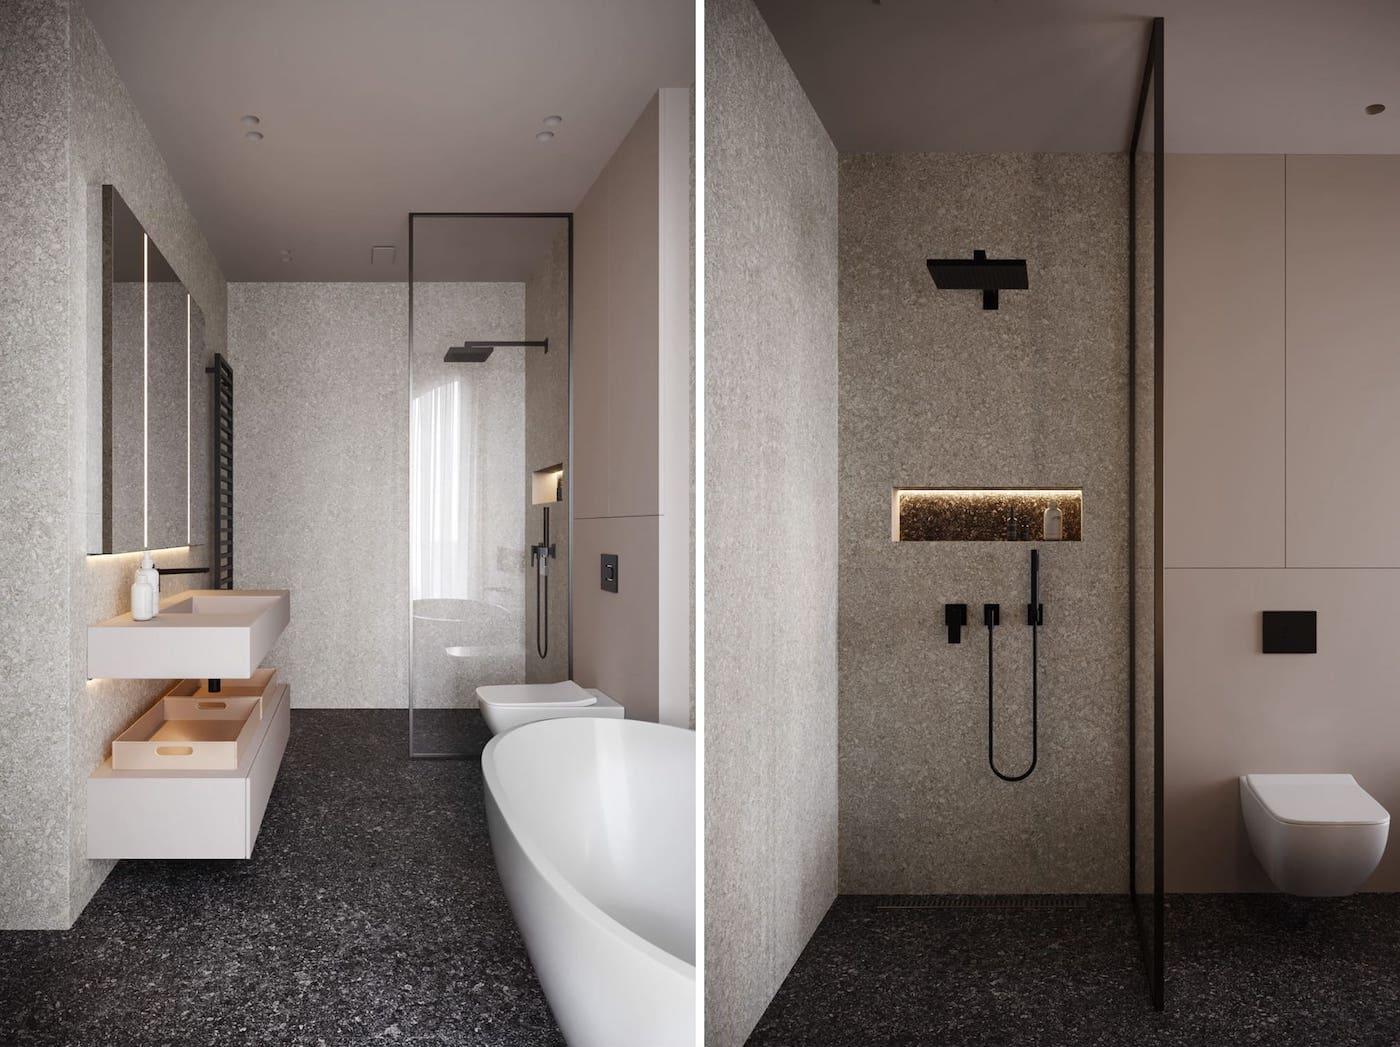 дизайн интерьера модной квартиры фото 10